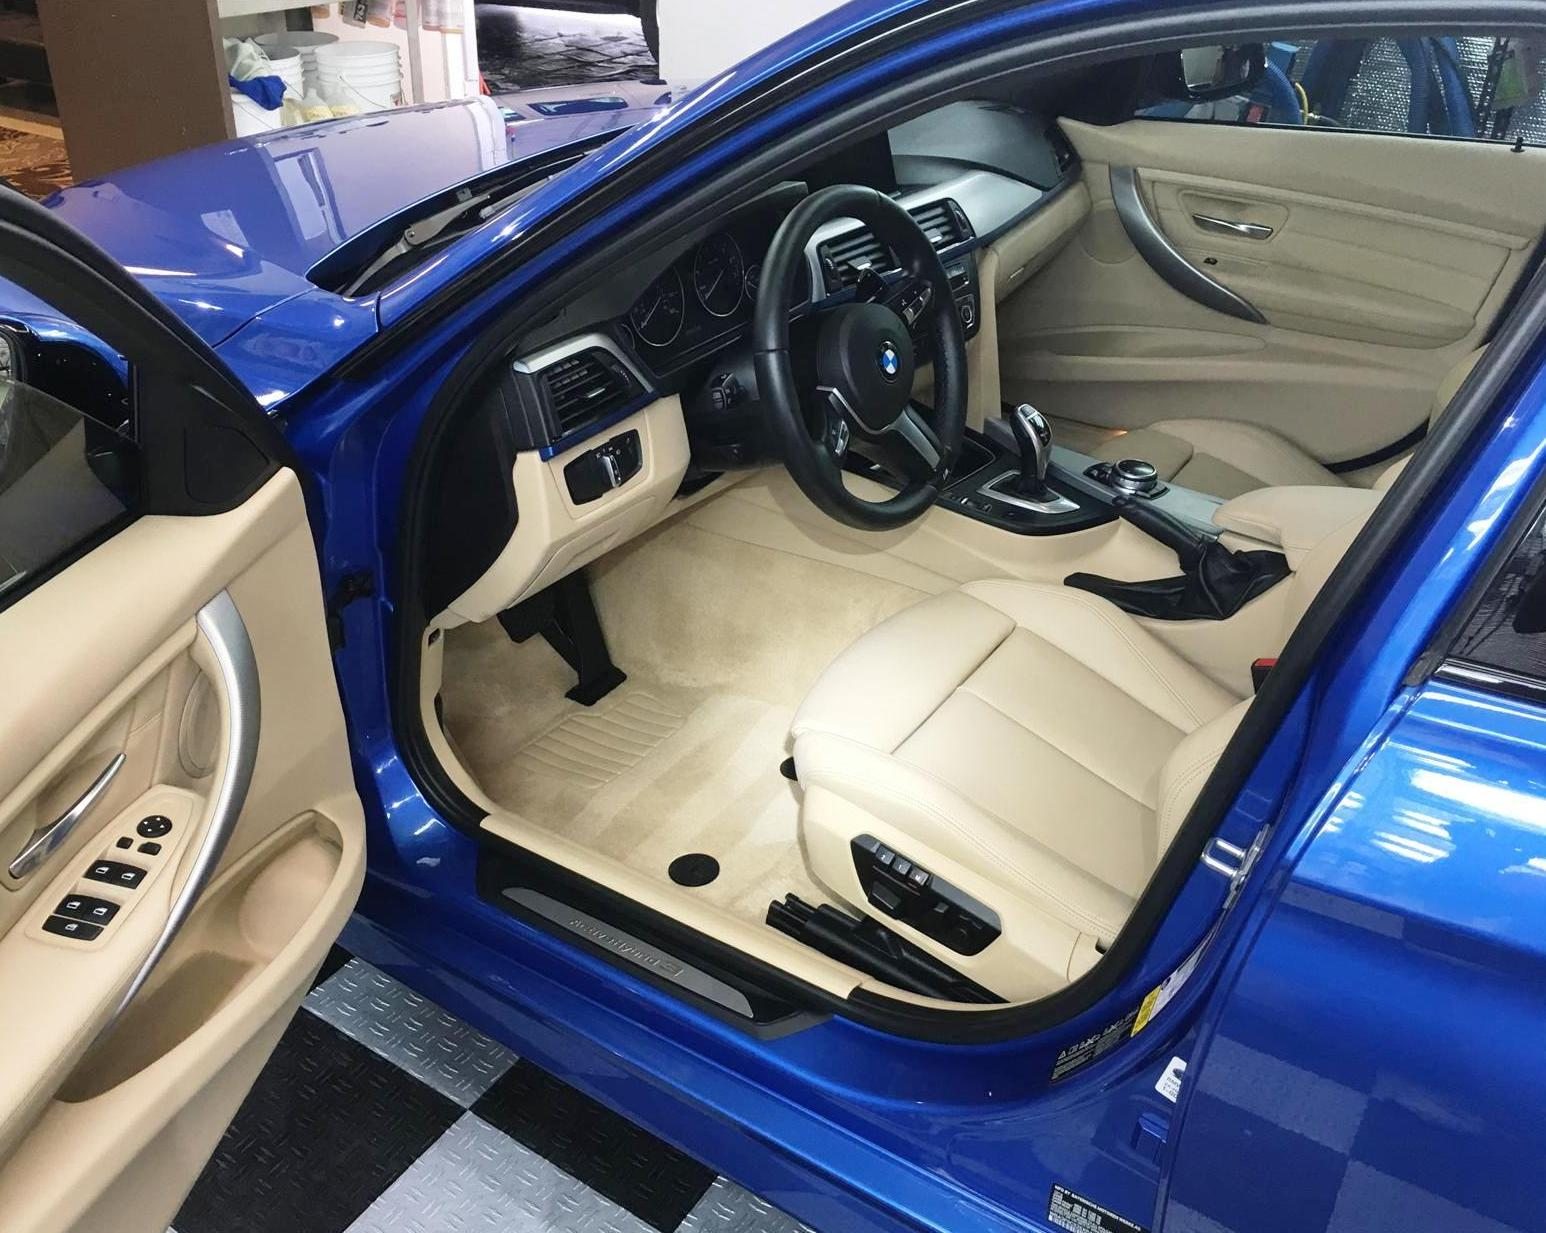 dealership services auto detailing auto detailing austin llc. Black Bedroom Furniture Sets. Home Design Ideas